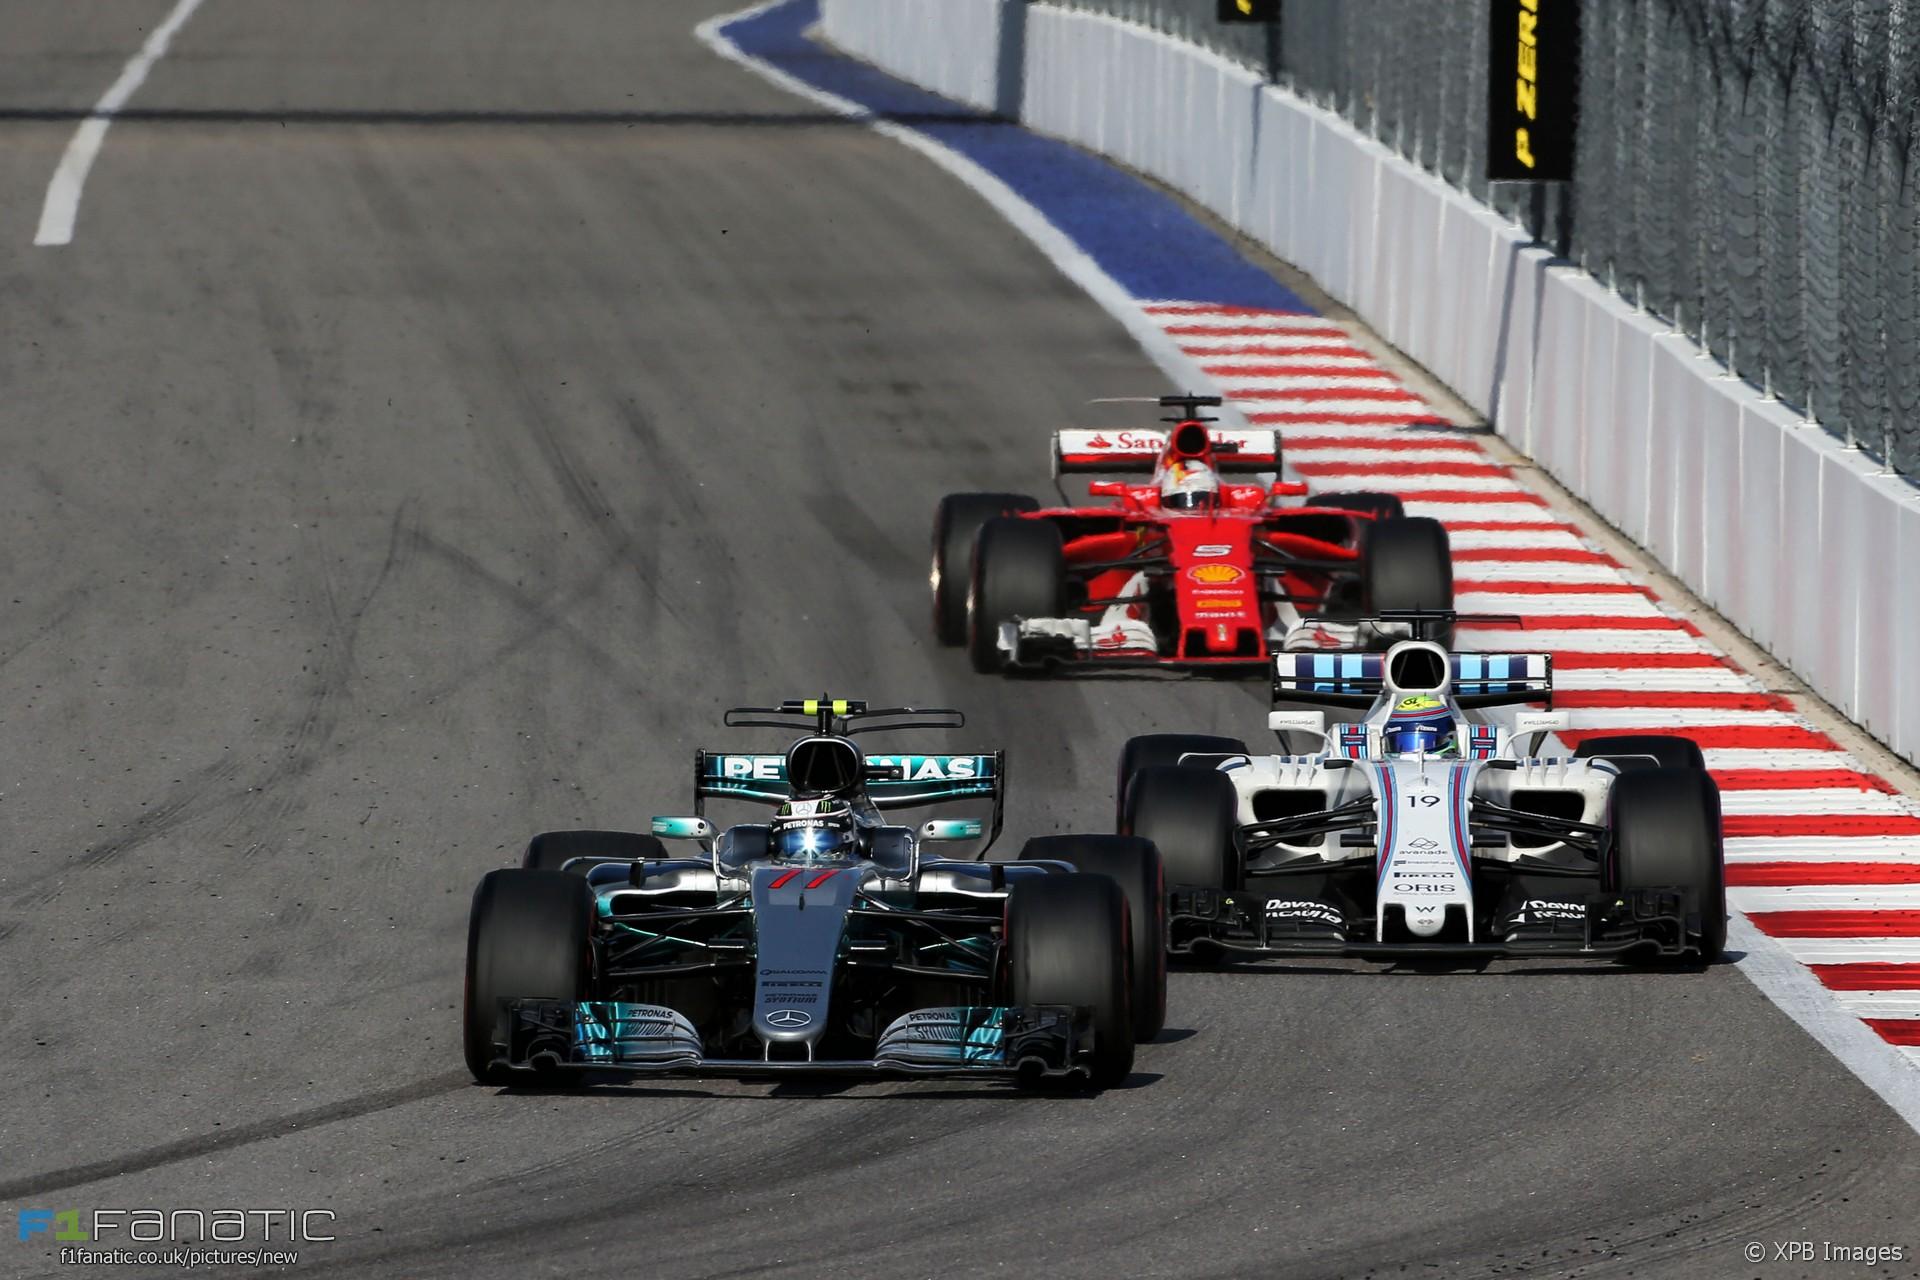 Valtteri Bottas, Mercedes, Sochi Autodrom, 2017